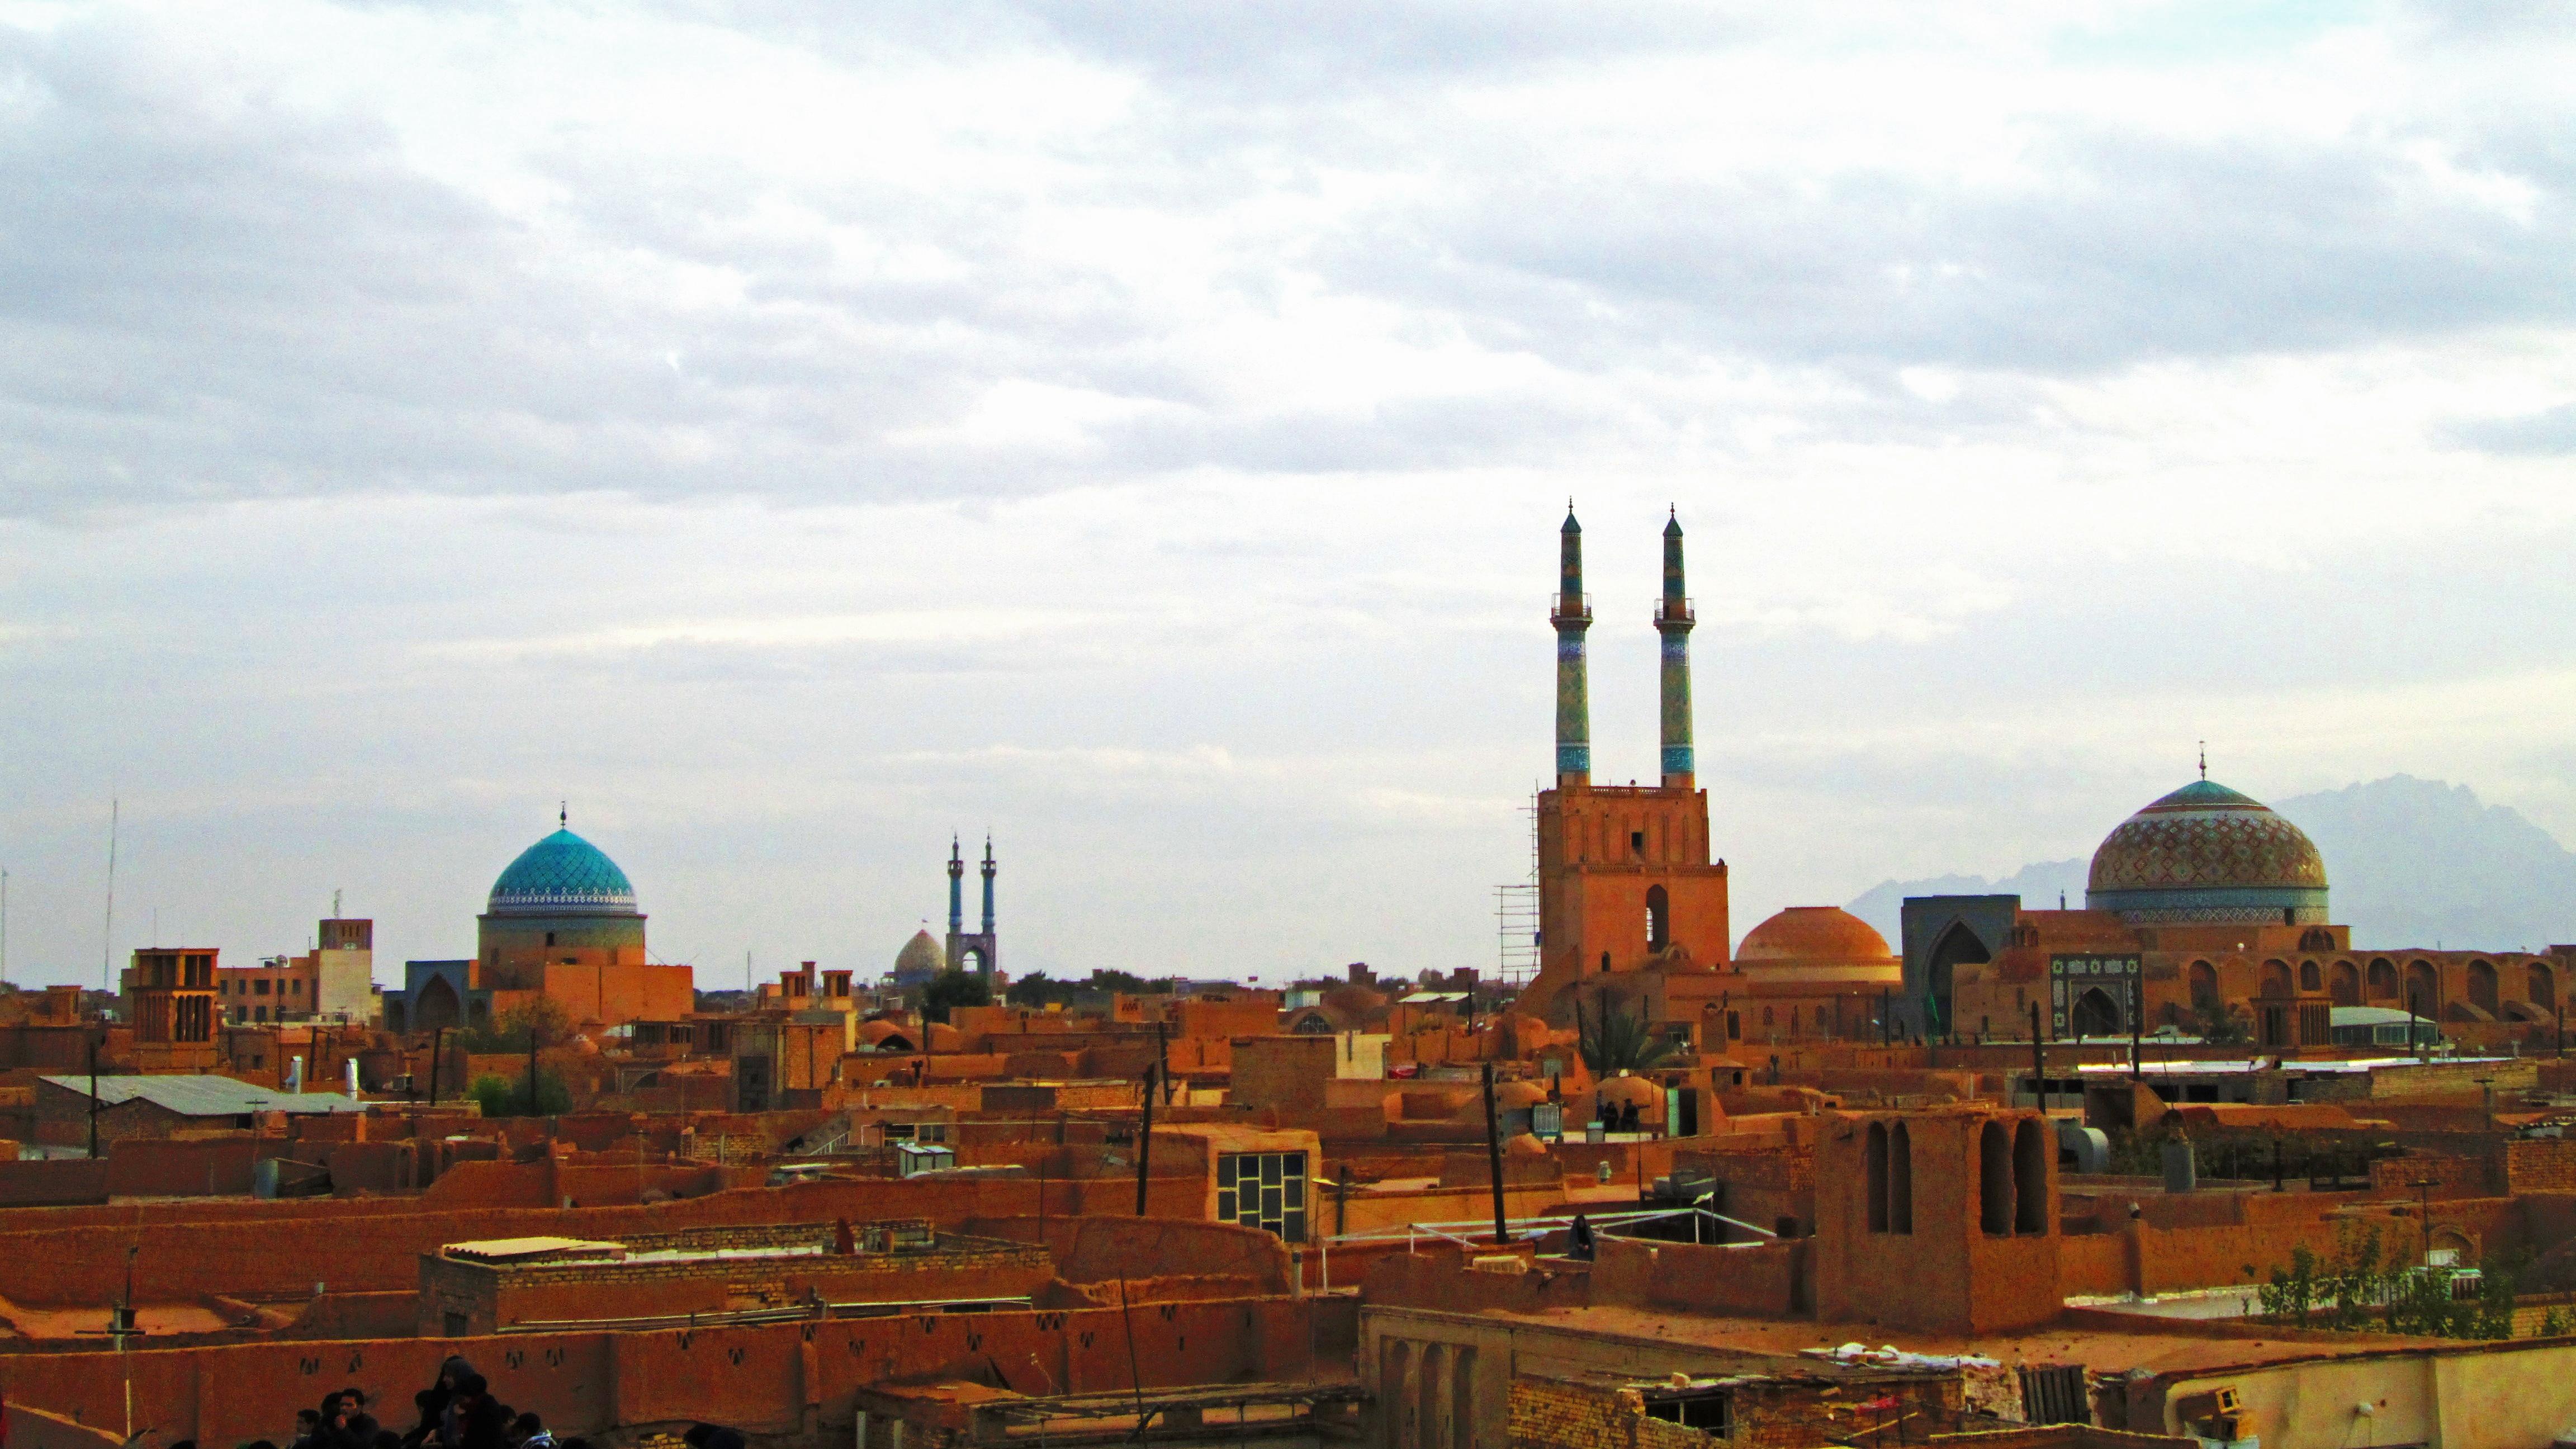 Yazd, Iran by zohreh1991